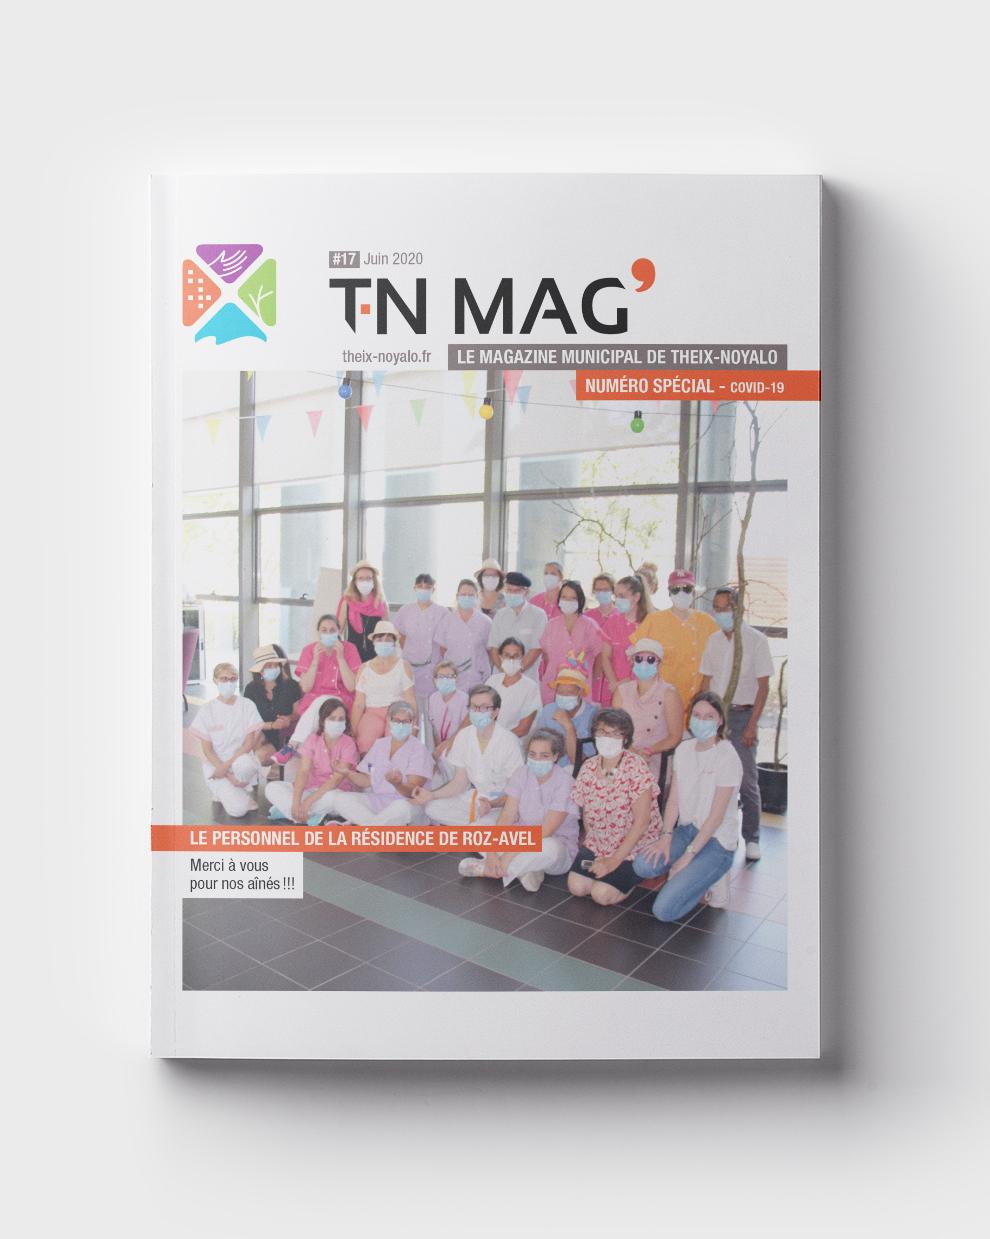 TN_MAG_COUV_2020